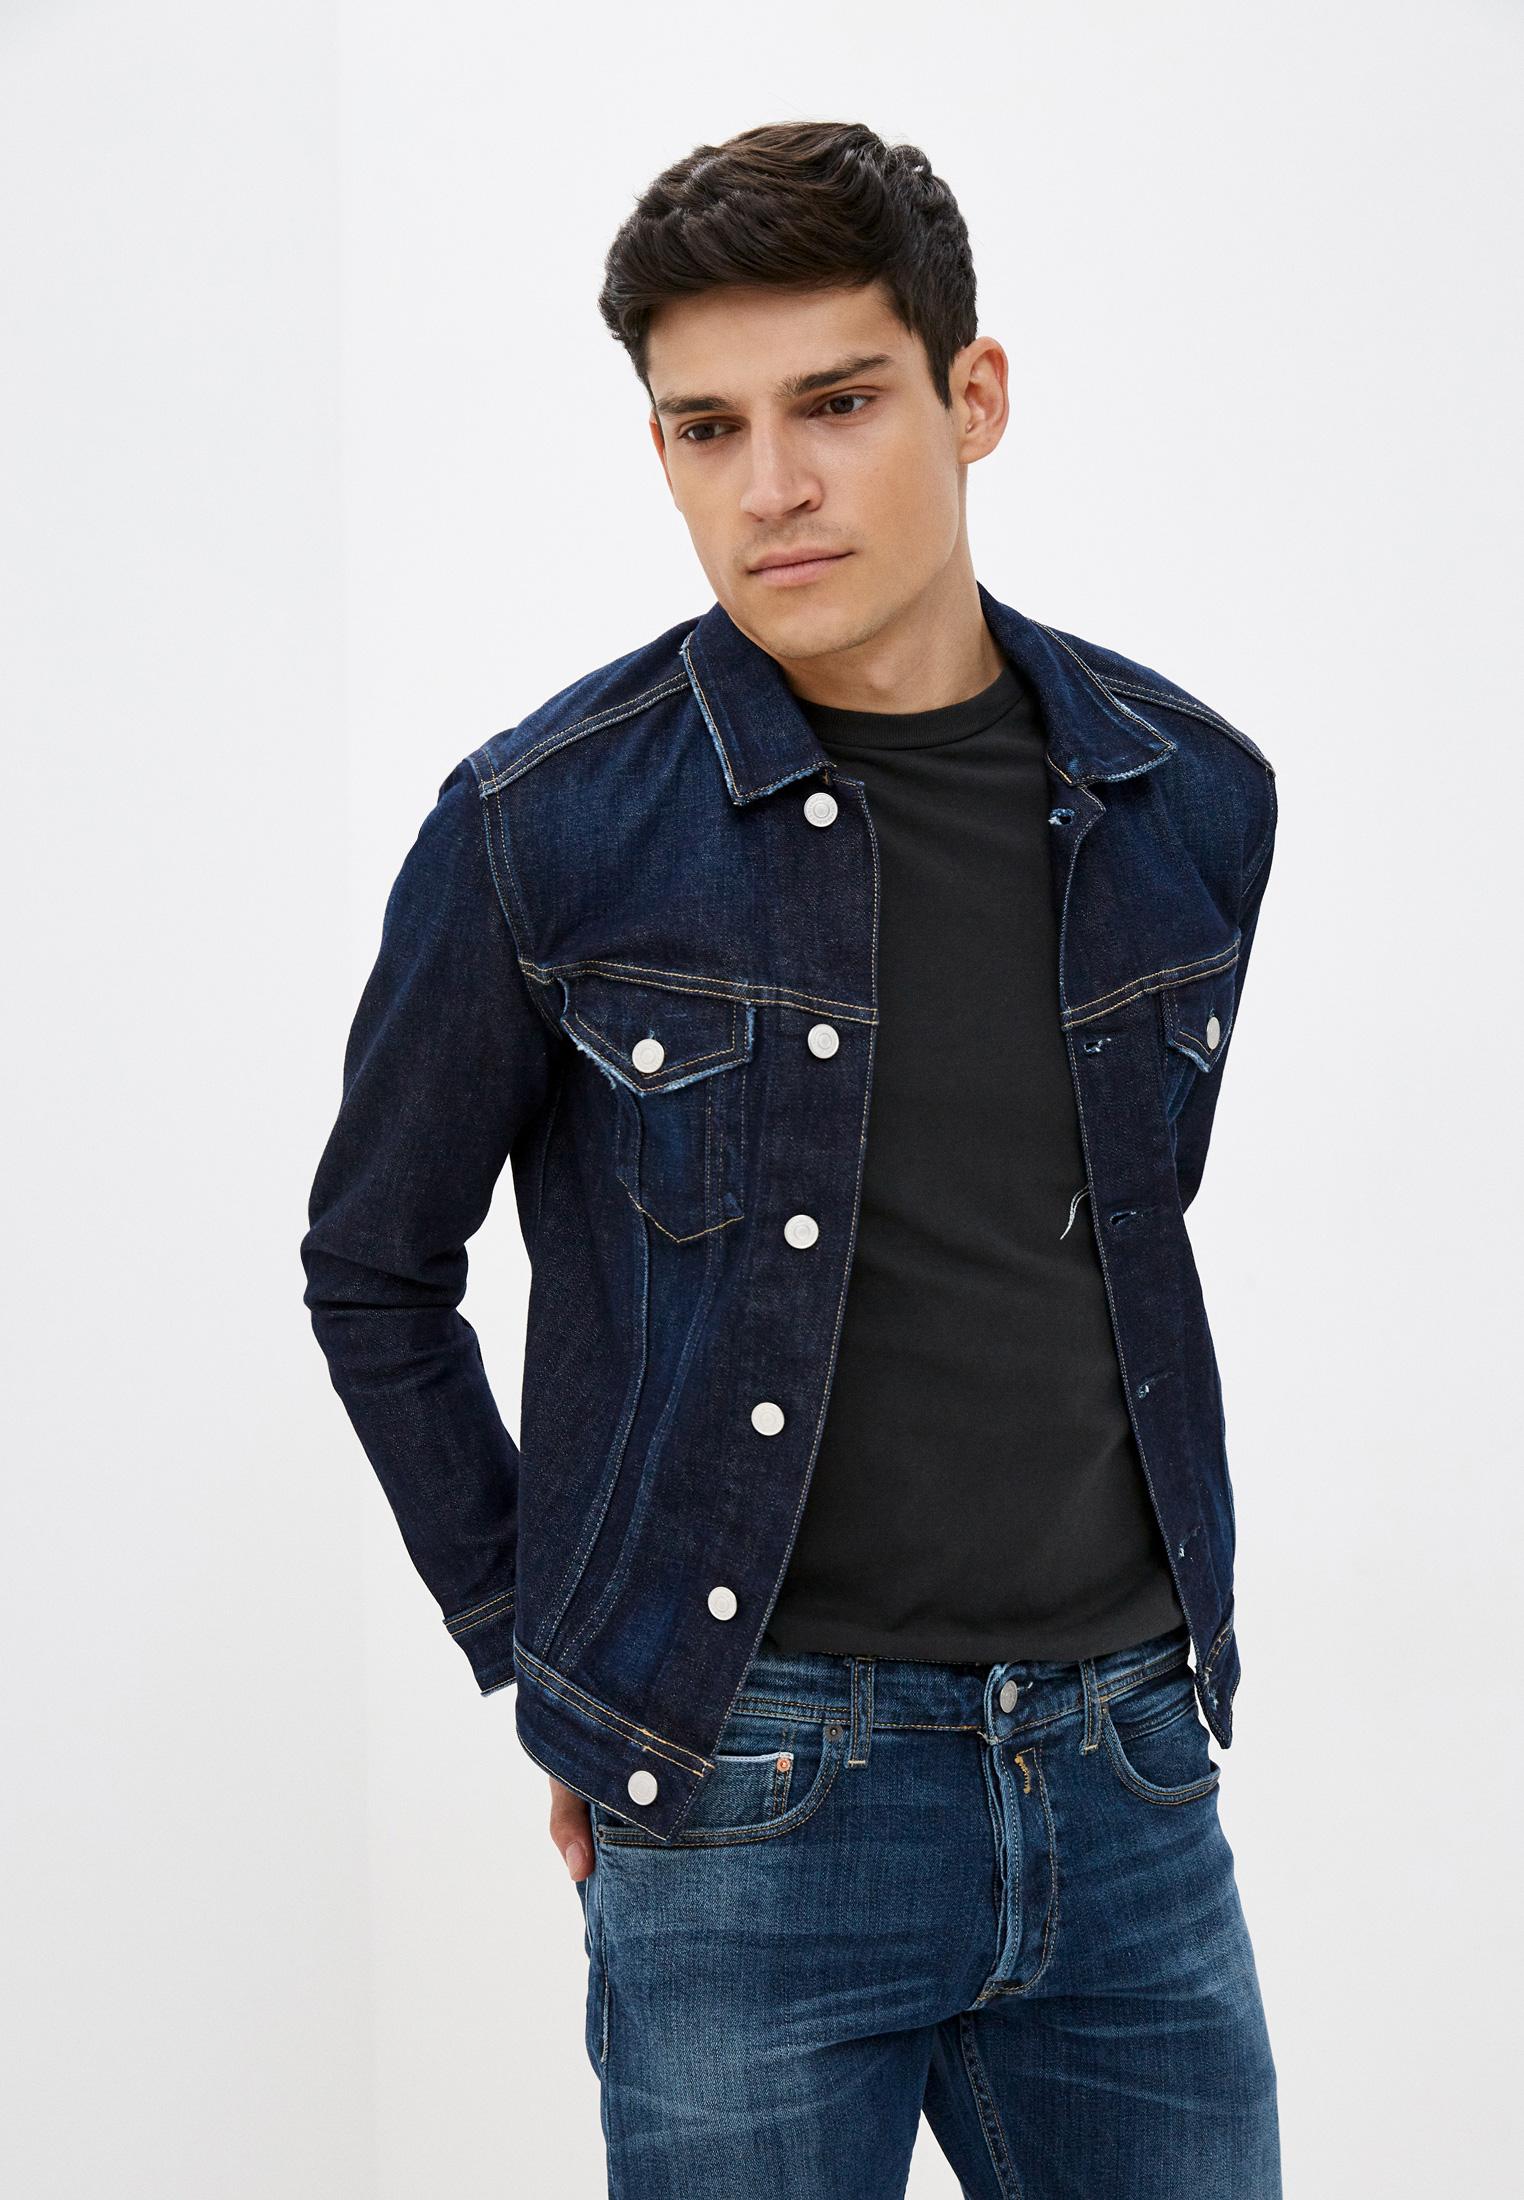 Джинсовая куртка Replay (Реплей) MV842J.000.425893